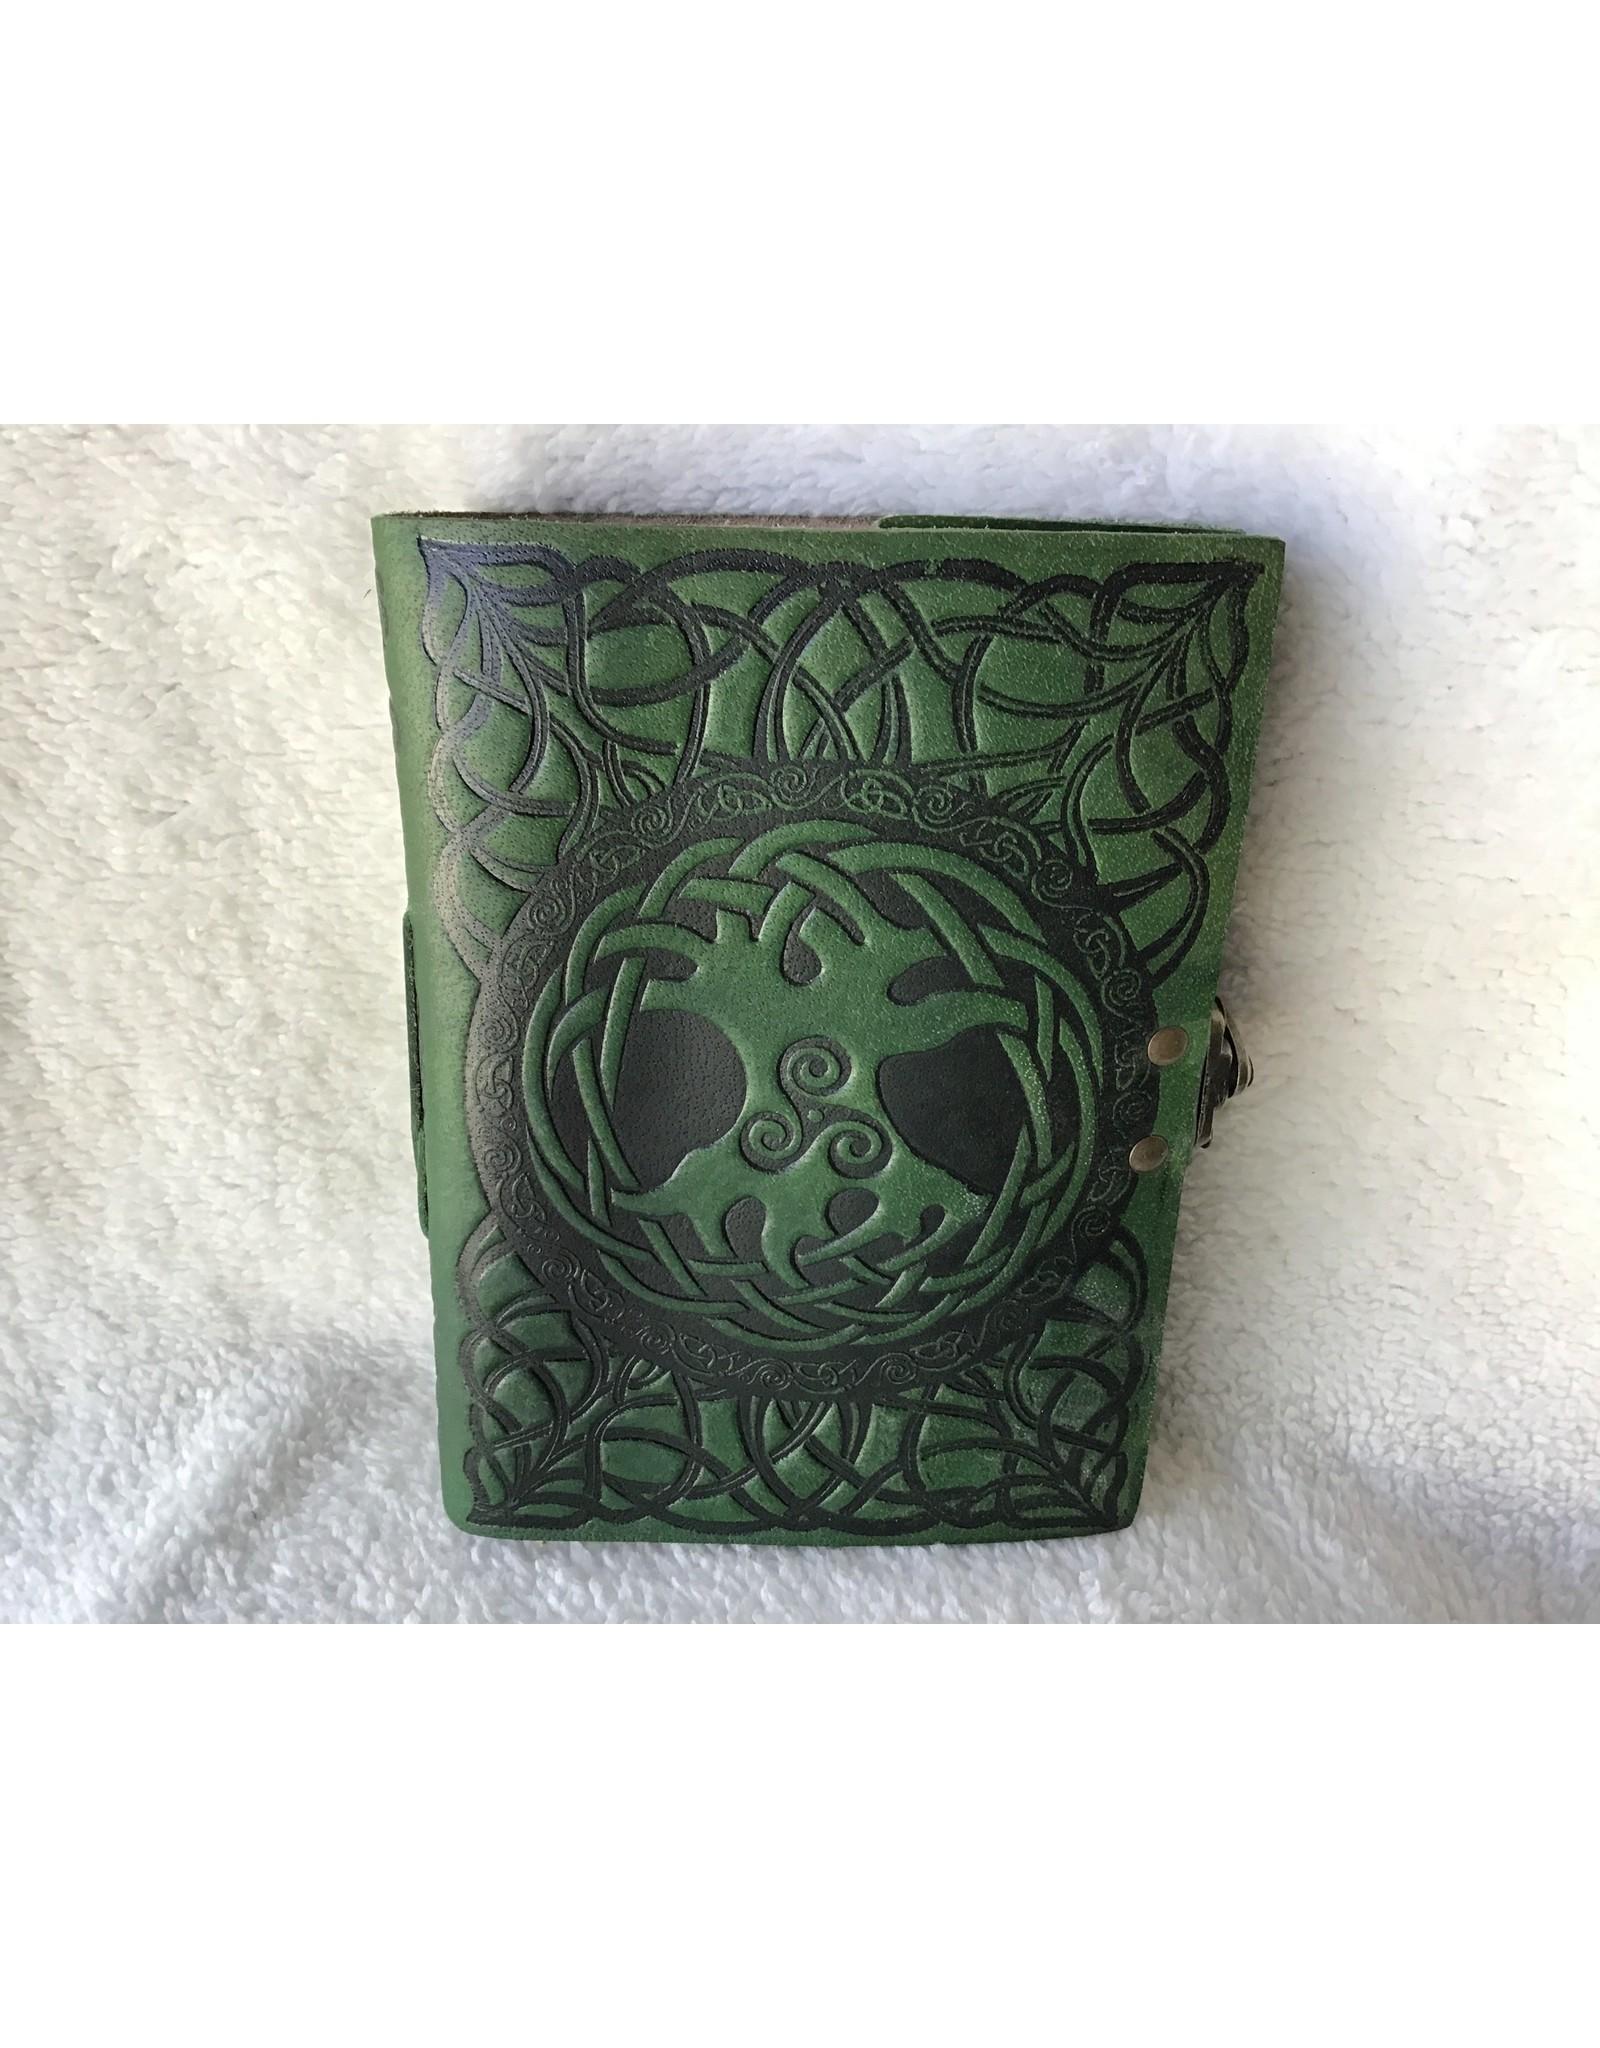 Keltic Designs Inc. Handmade Leather Journals